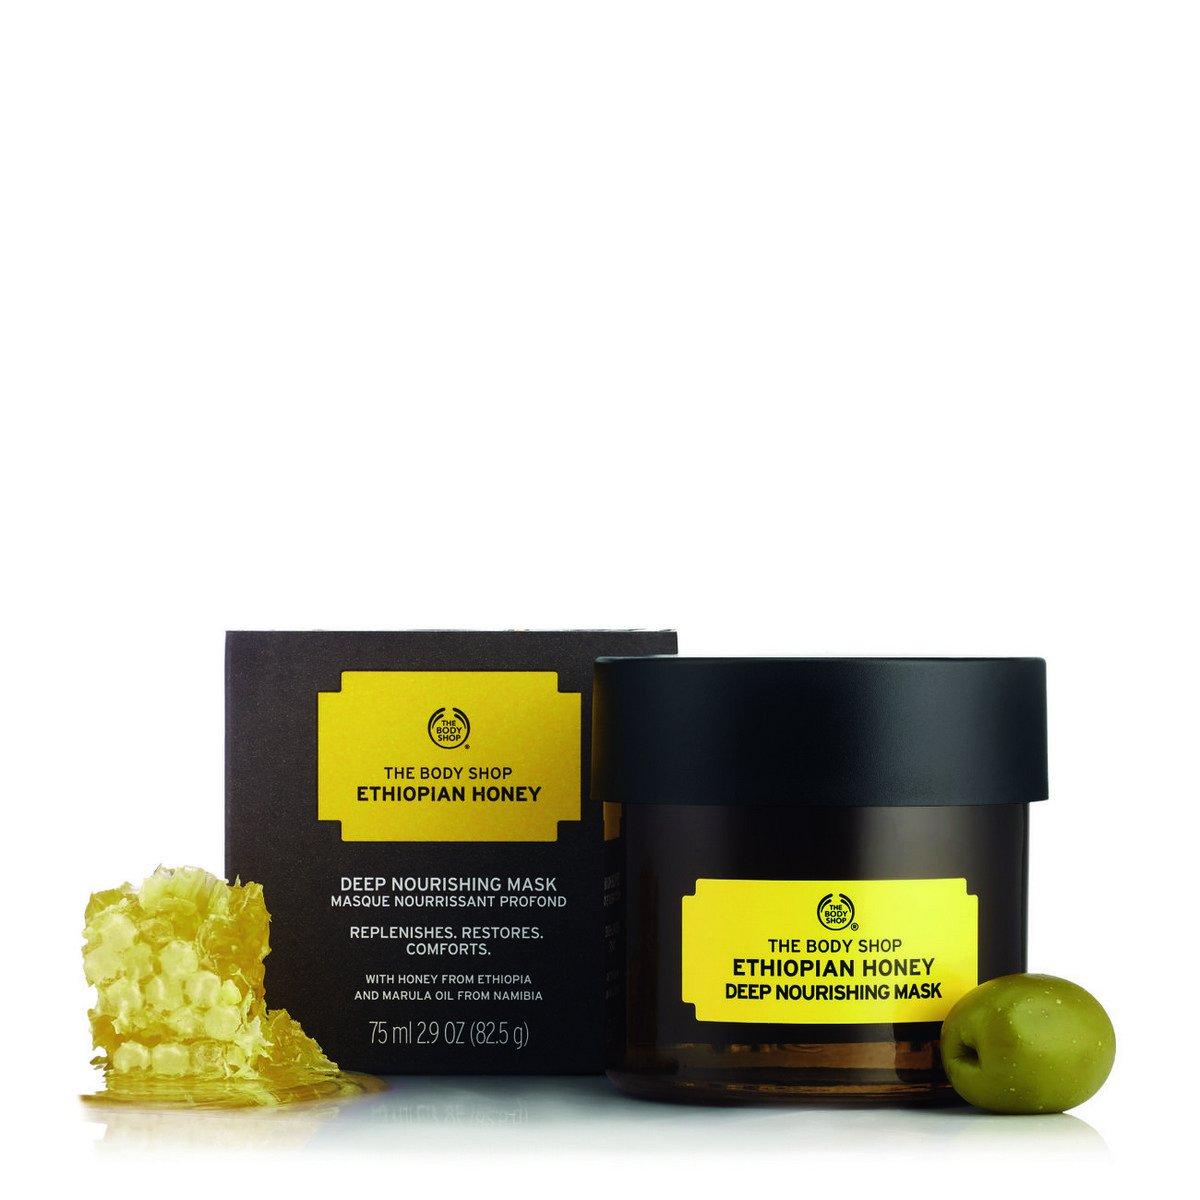 The Body Shop Ethiopian Honey Deep Nourishing Mask, 75ml